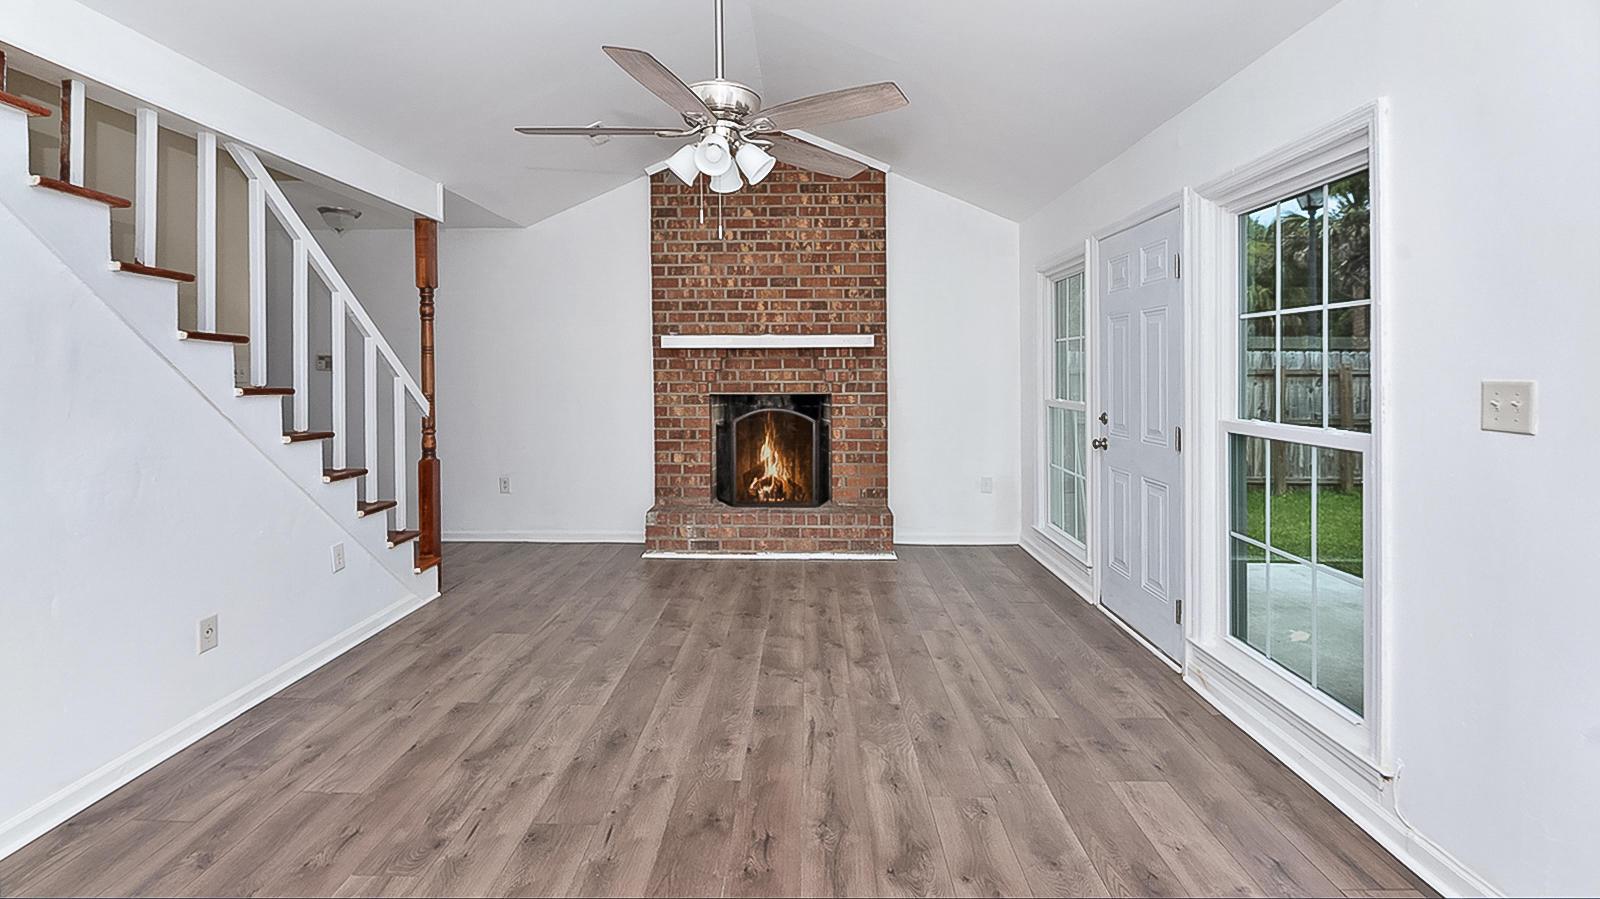 Ashley Villas Homes For Sale - 4315 Briarstone, North Charleston, SC - 9